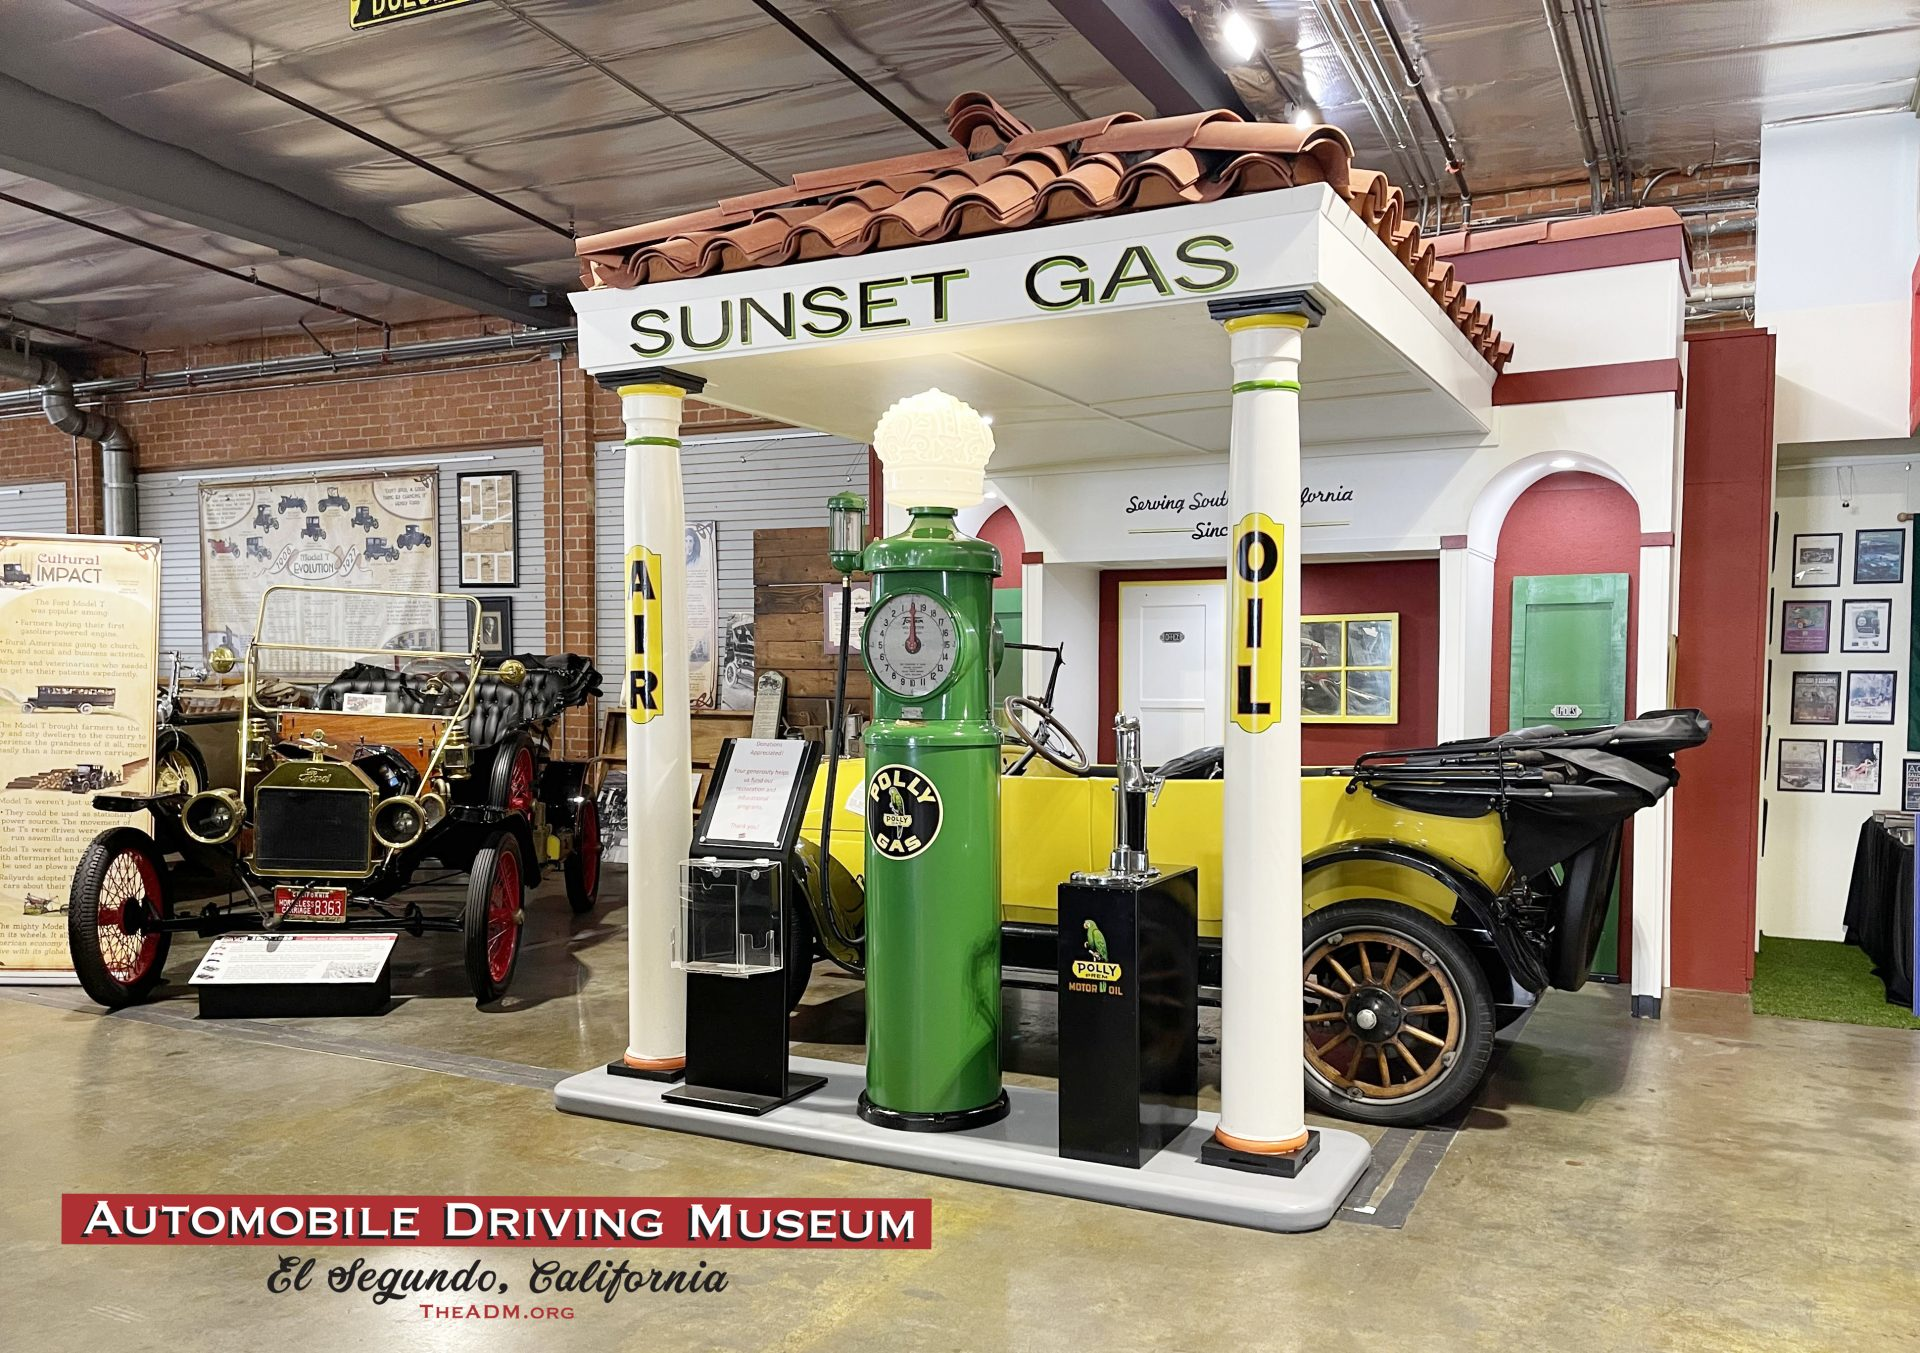 Sunset Gas Vintage Gas Station El Segundo Car Museum